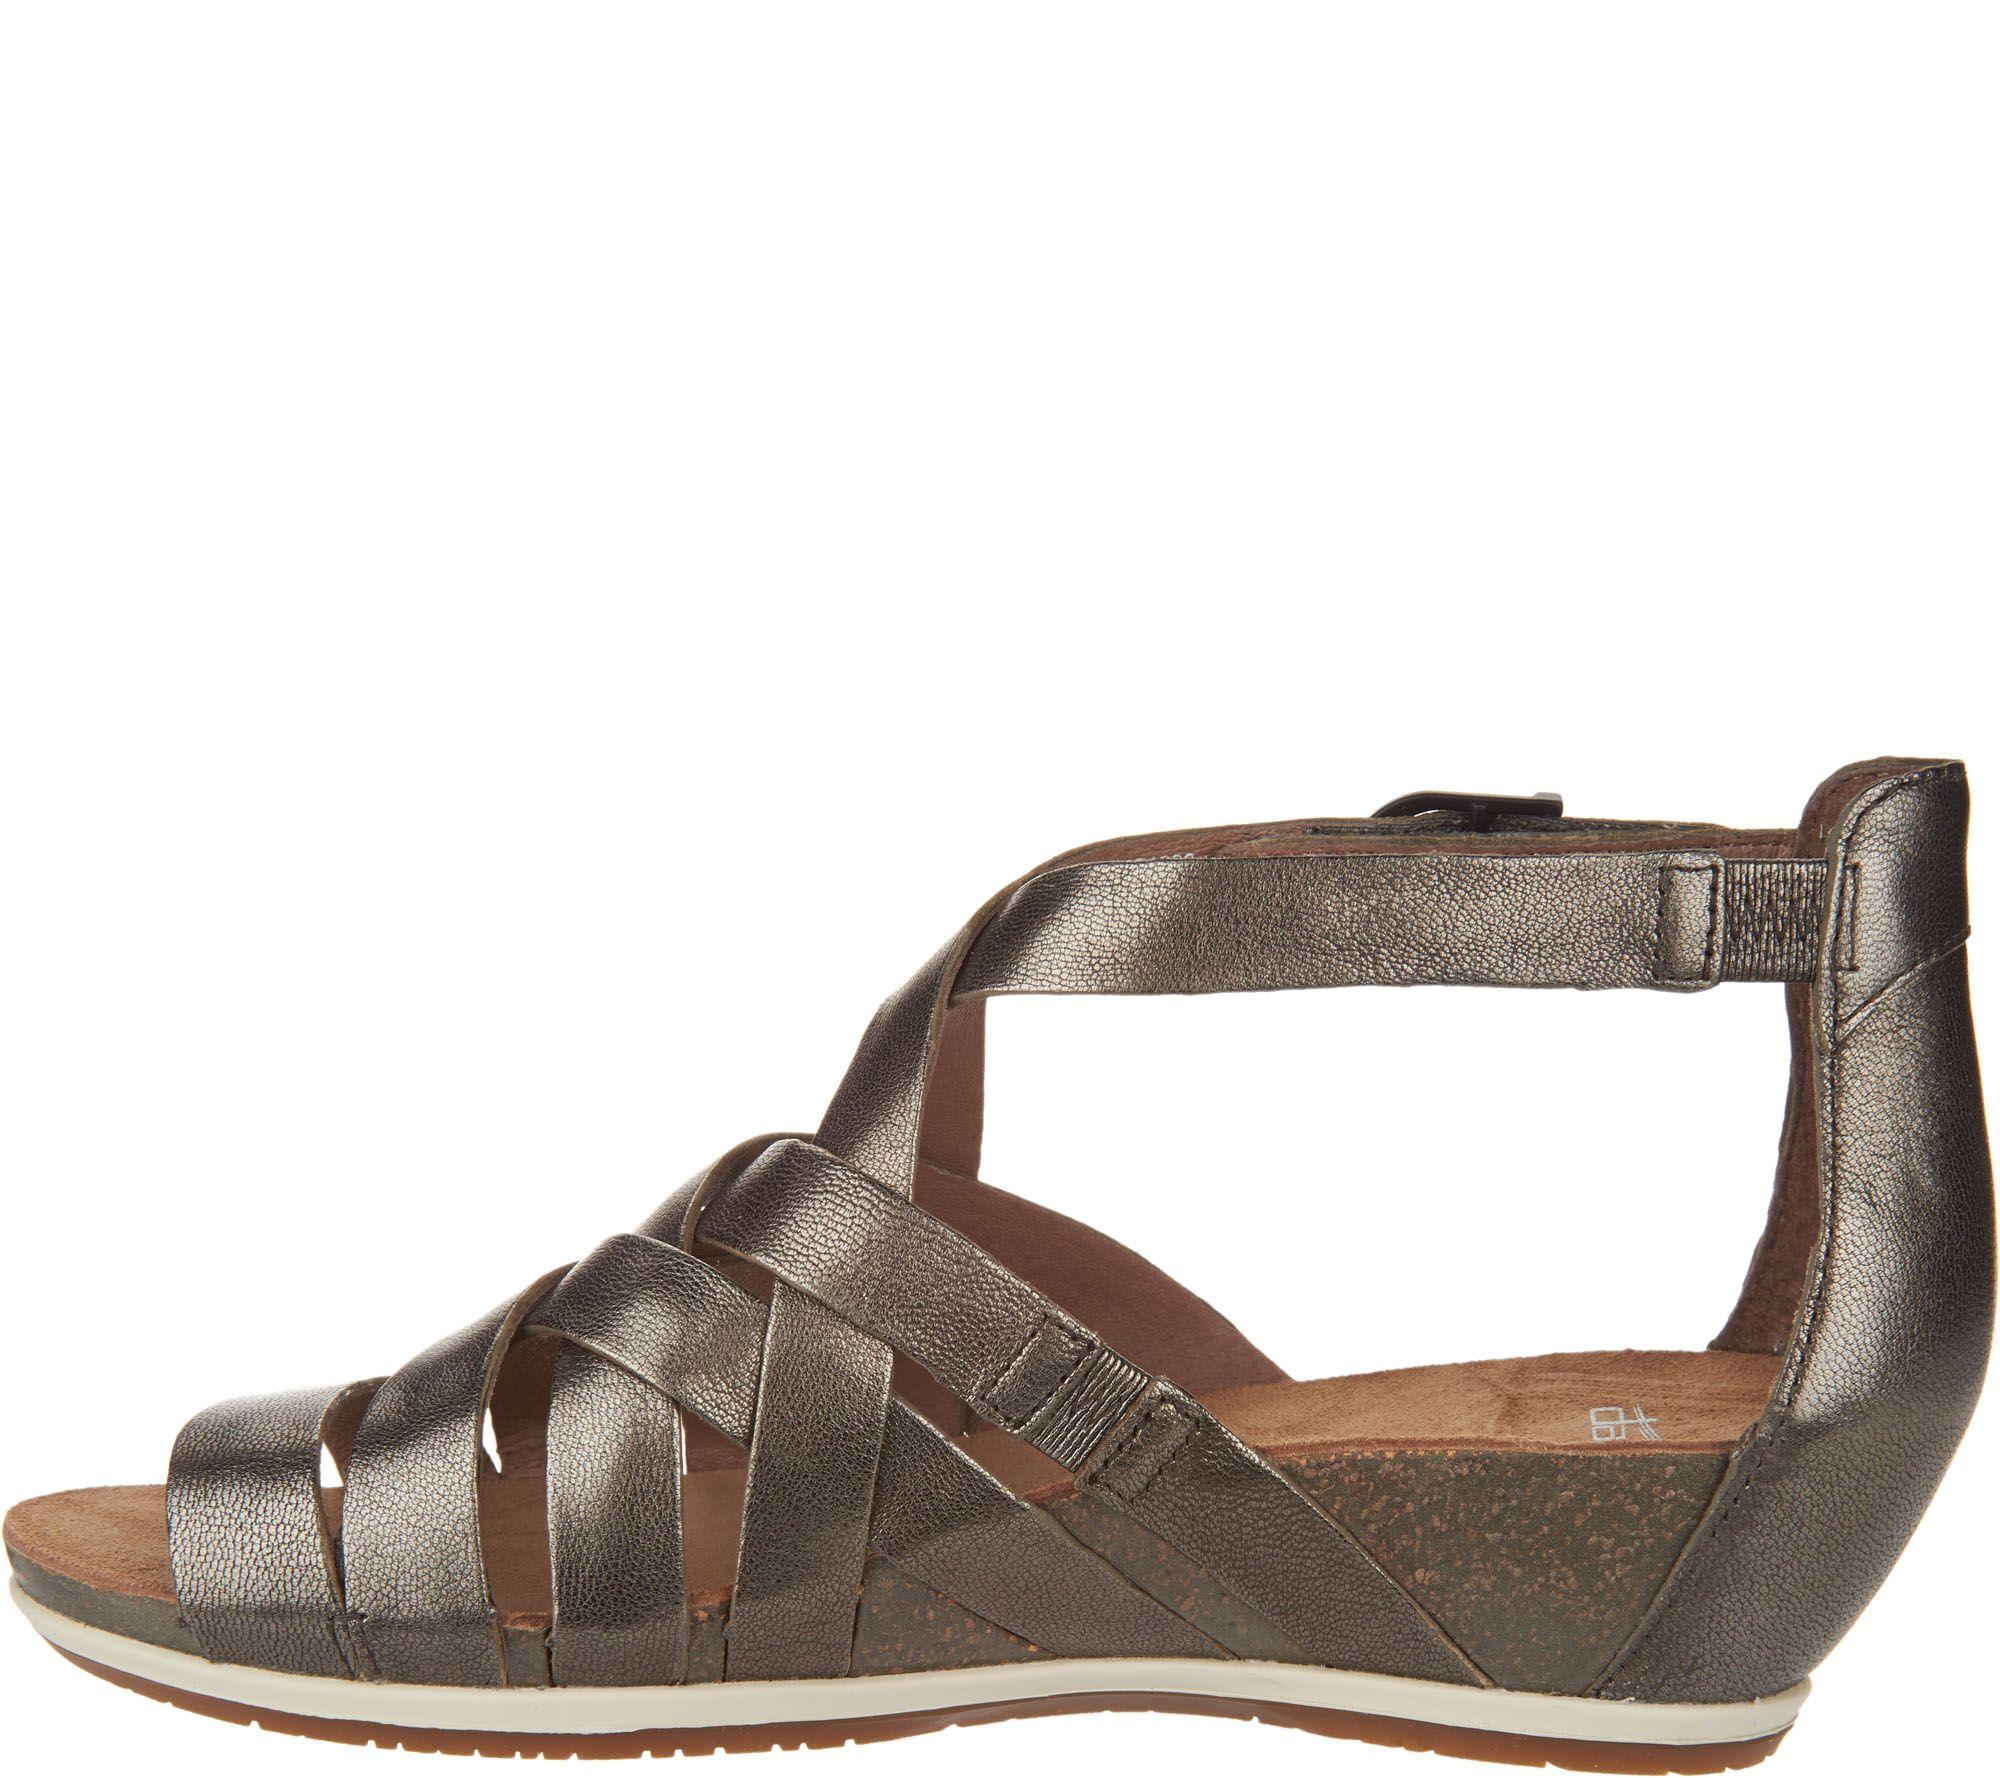 5fe2014b739 Dansko Leather Multi-strap Wedge Sandals - Vivian - Page 1 — QVC.com